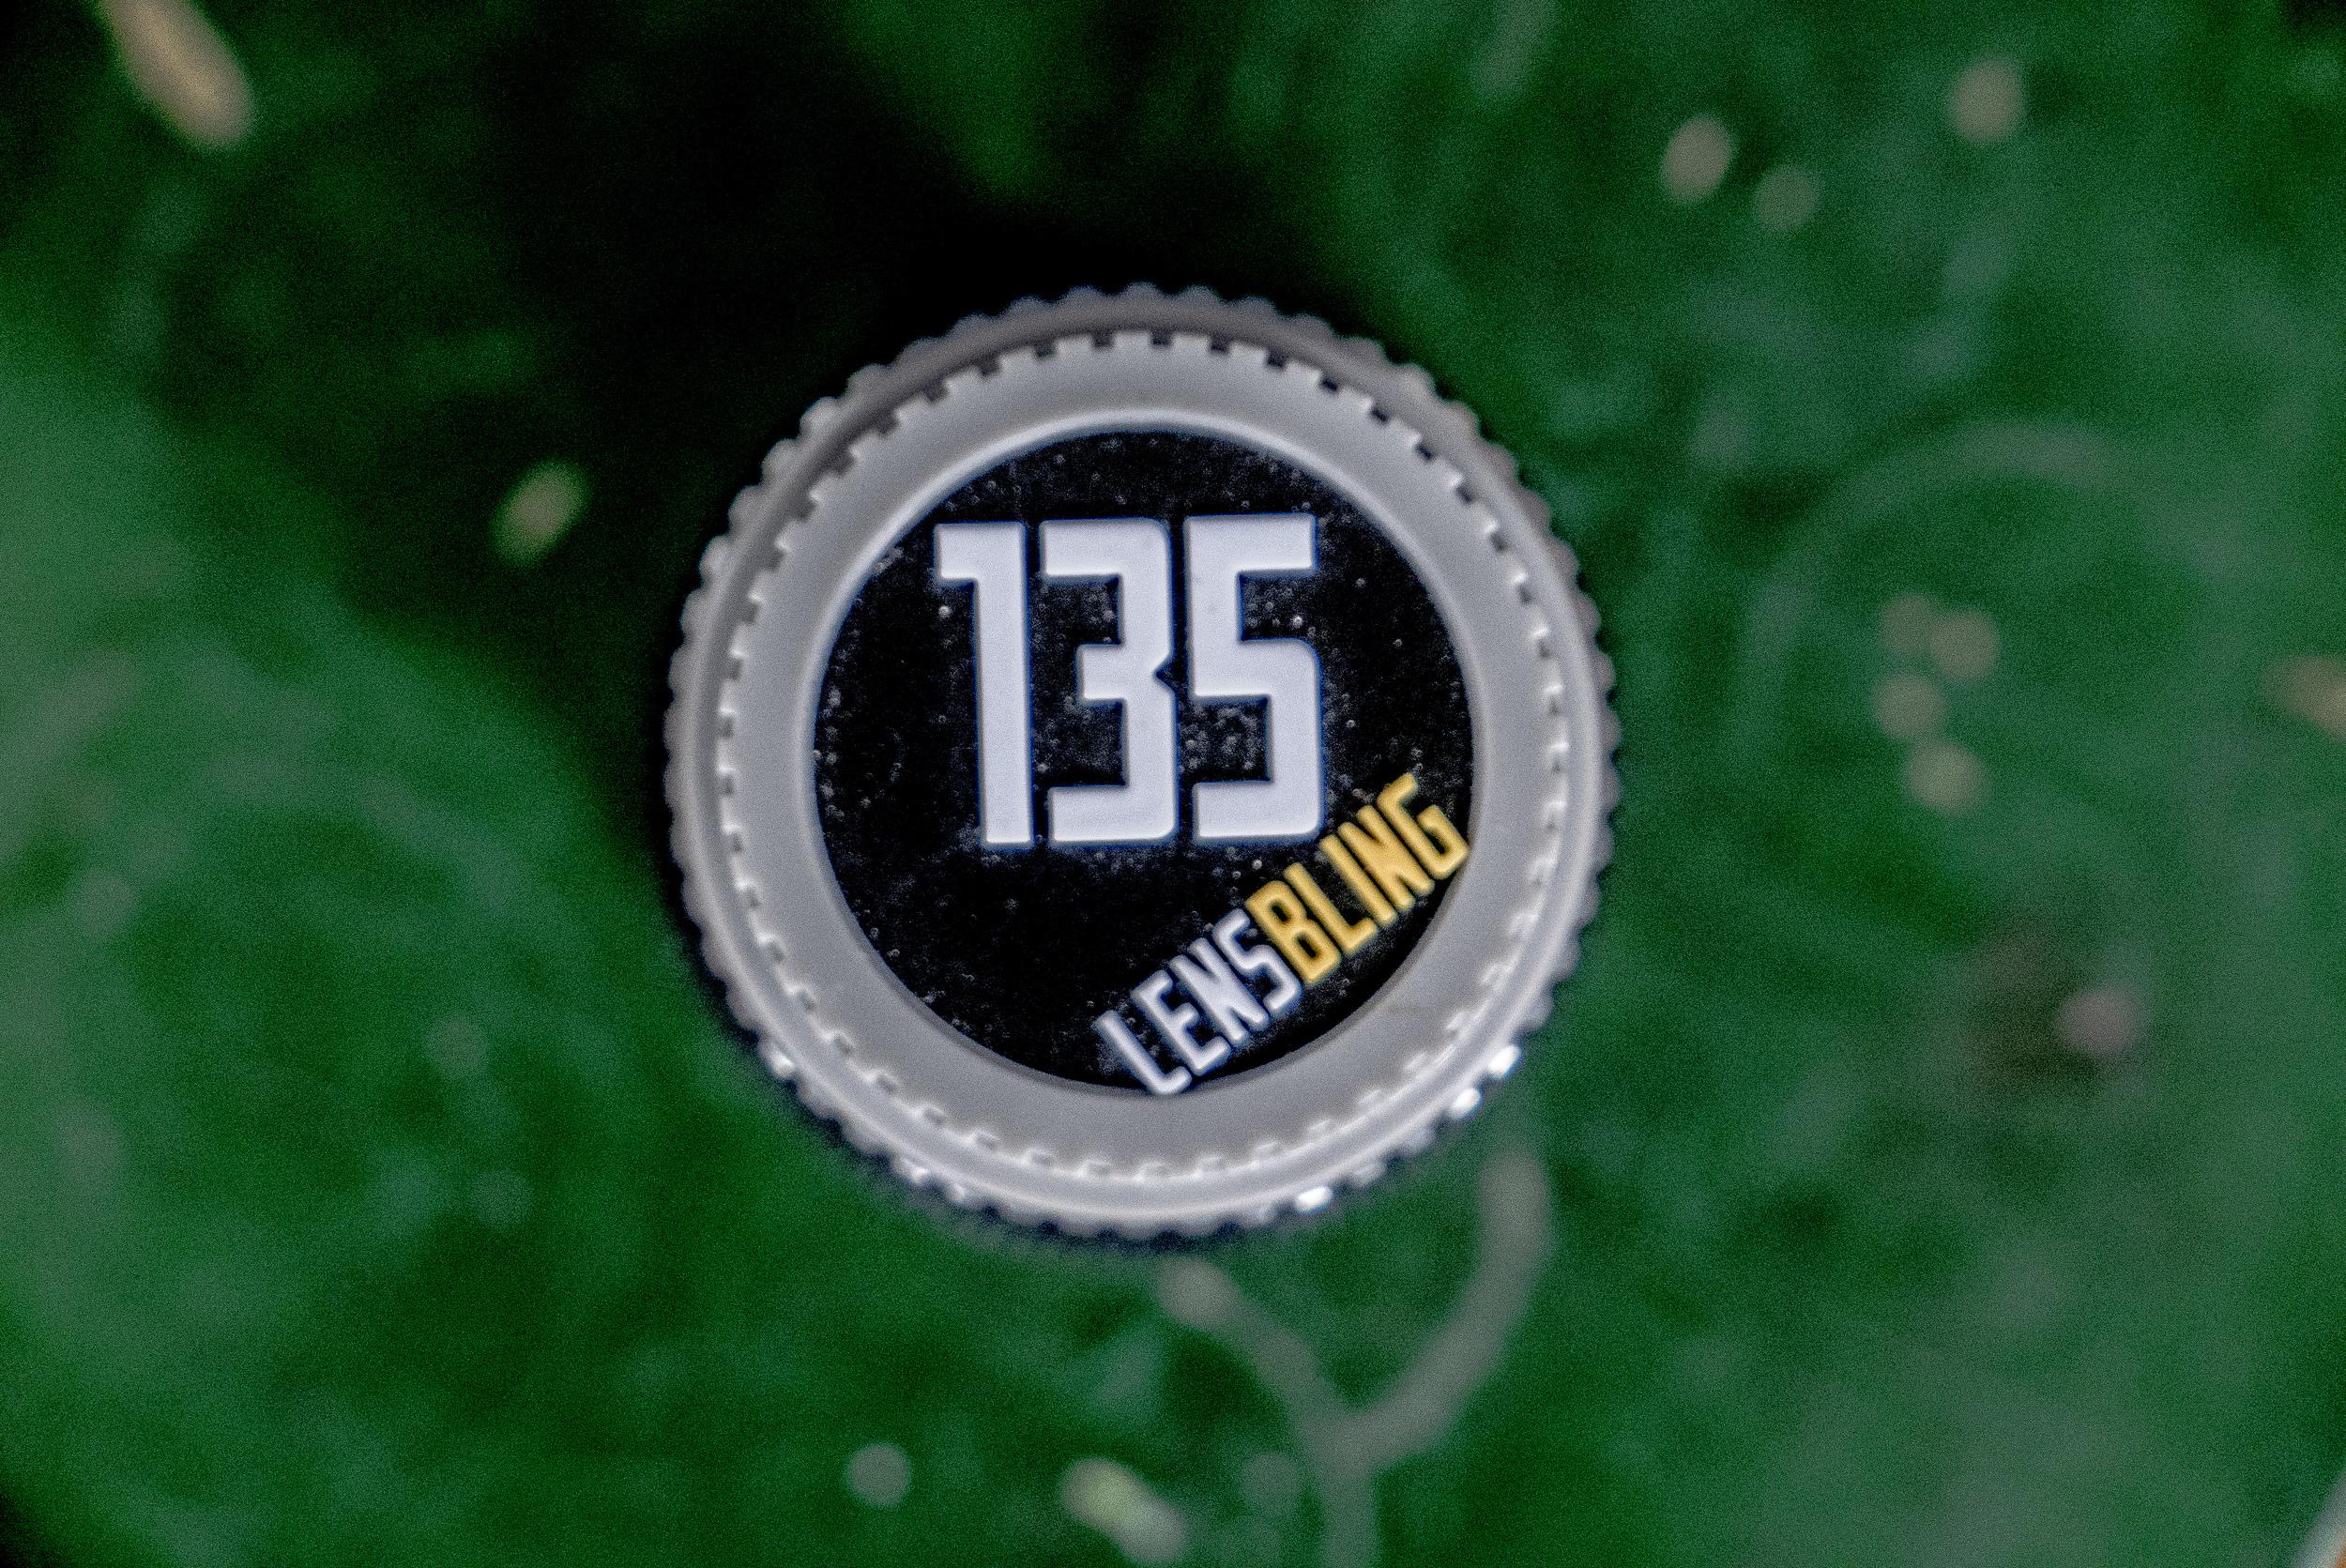 P1250135.JPG